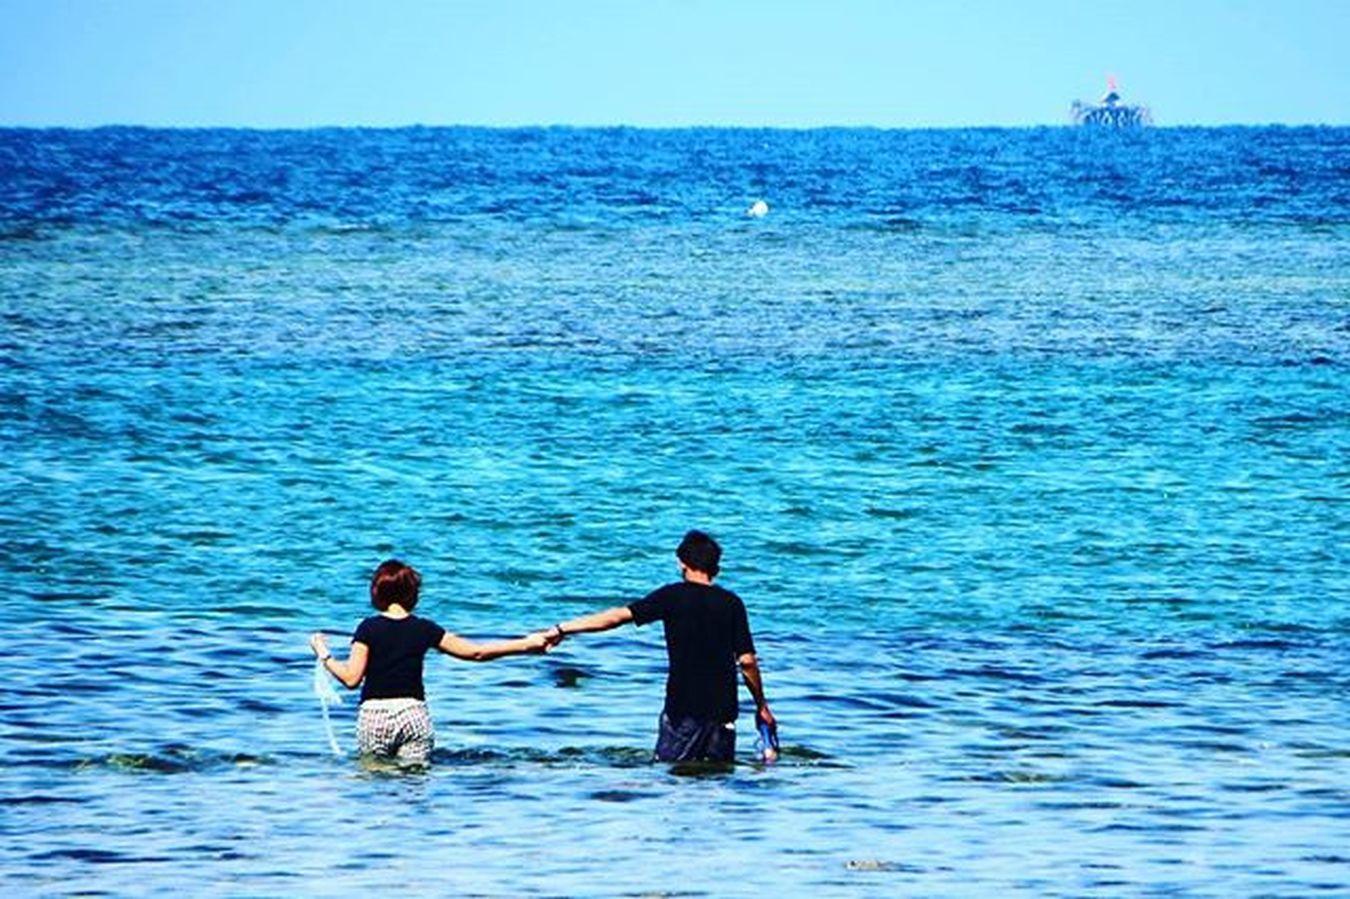 Romance Sea Snorkeling Romantic Withlove Happiness Trikorabeach Bintanisland Loveisland